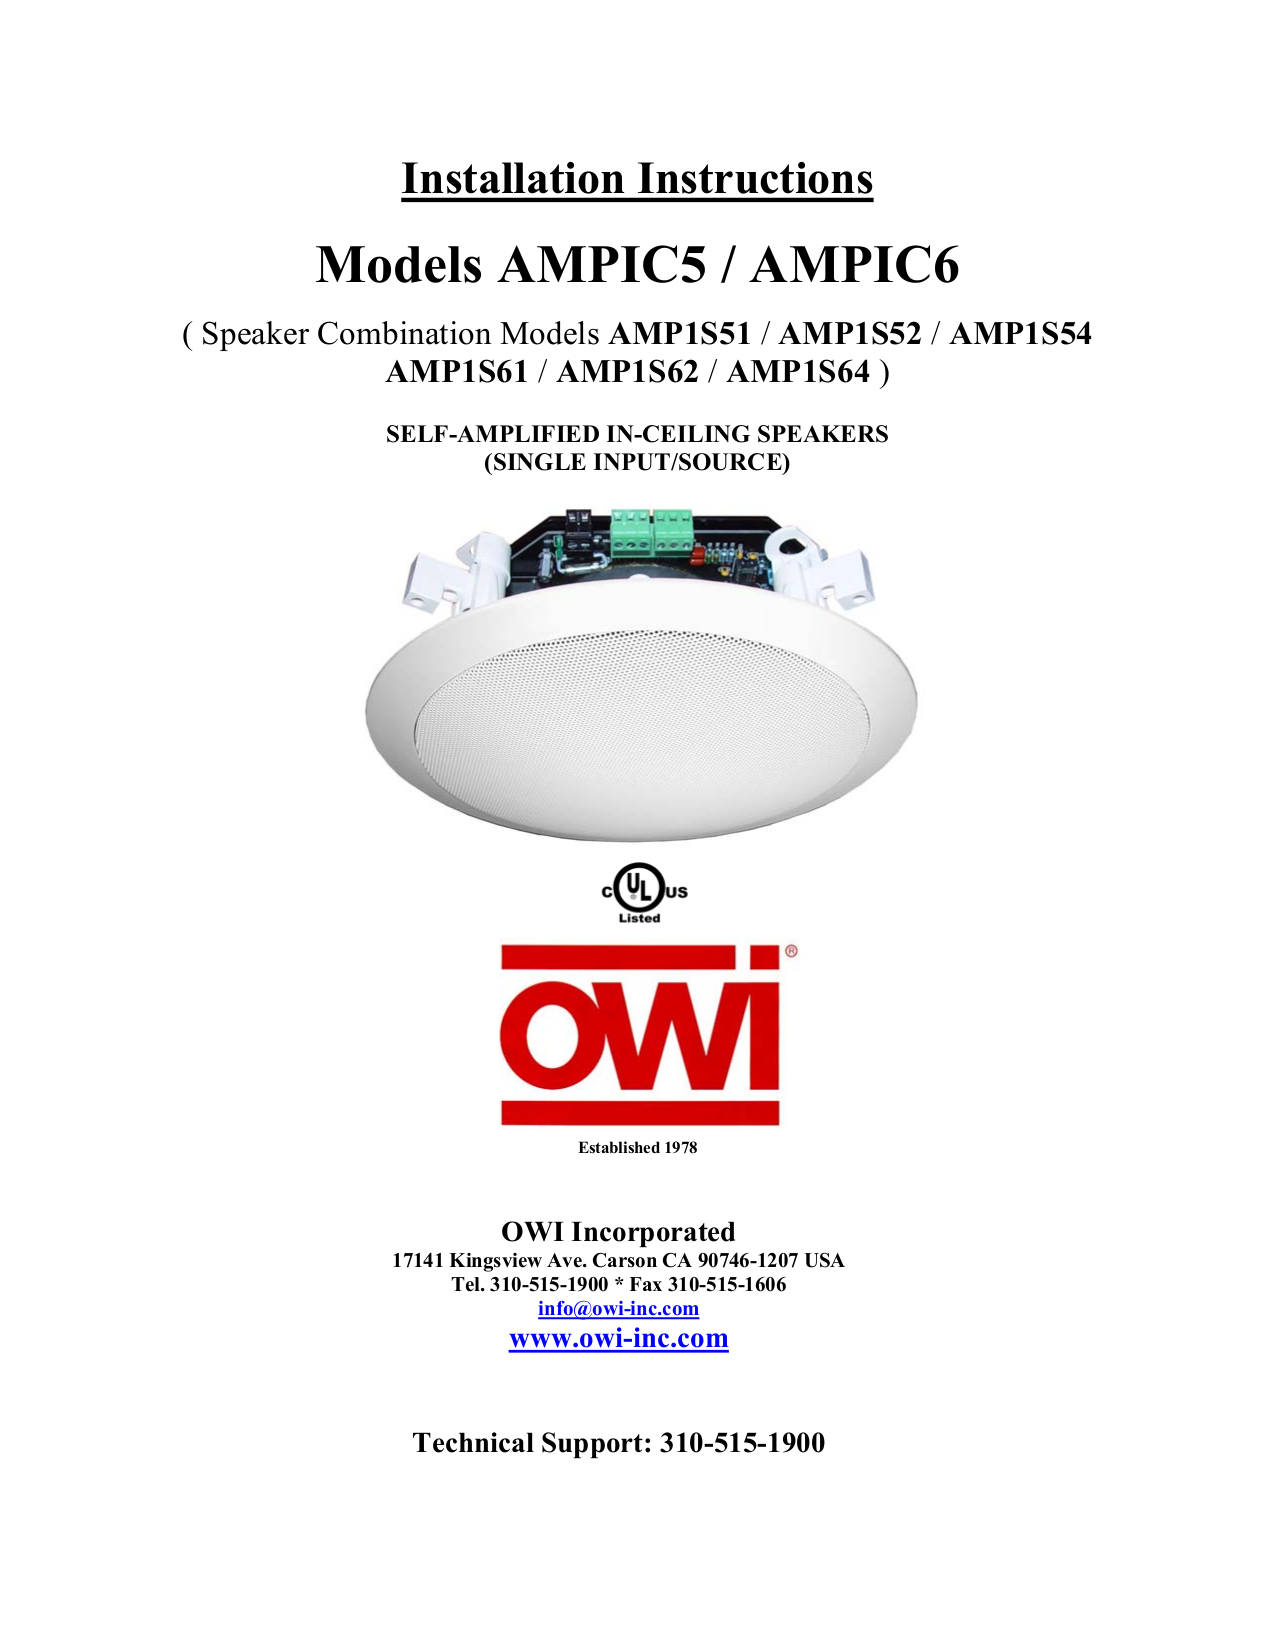 pdf for Owi Speaker IC6 manual